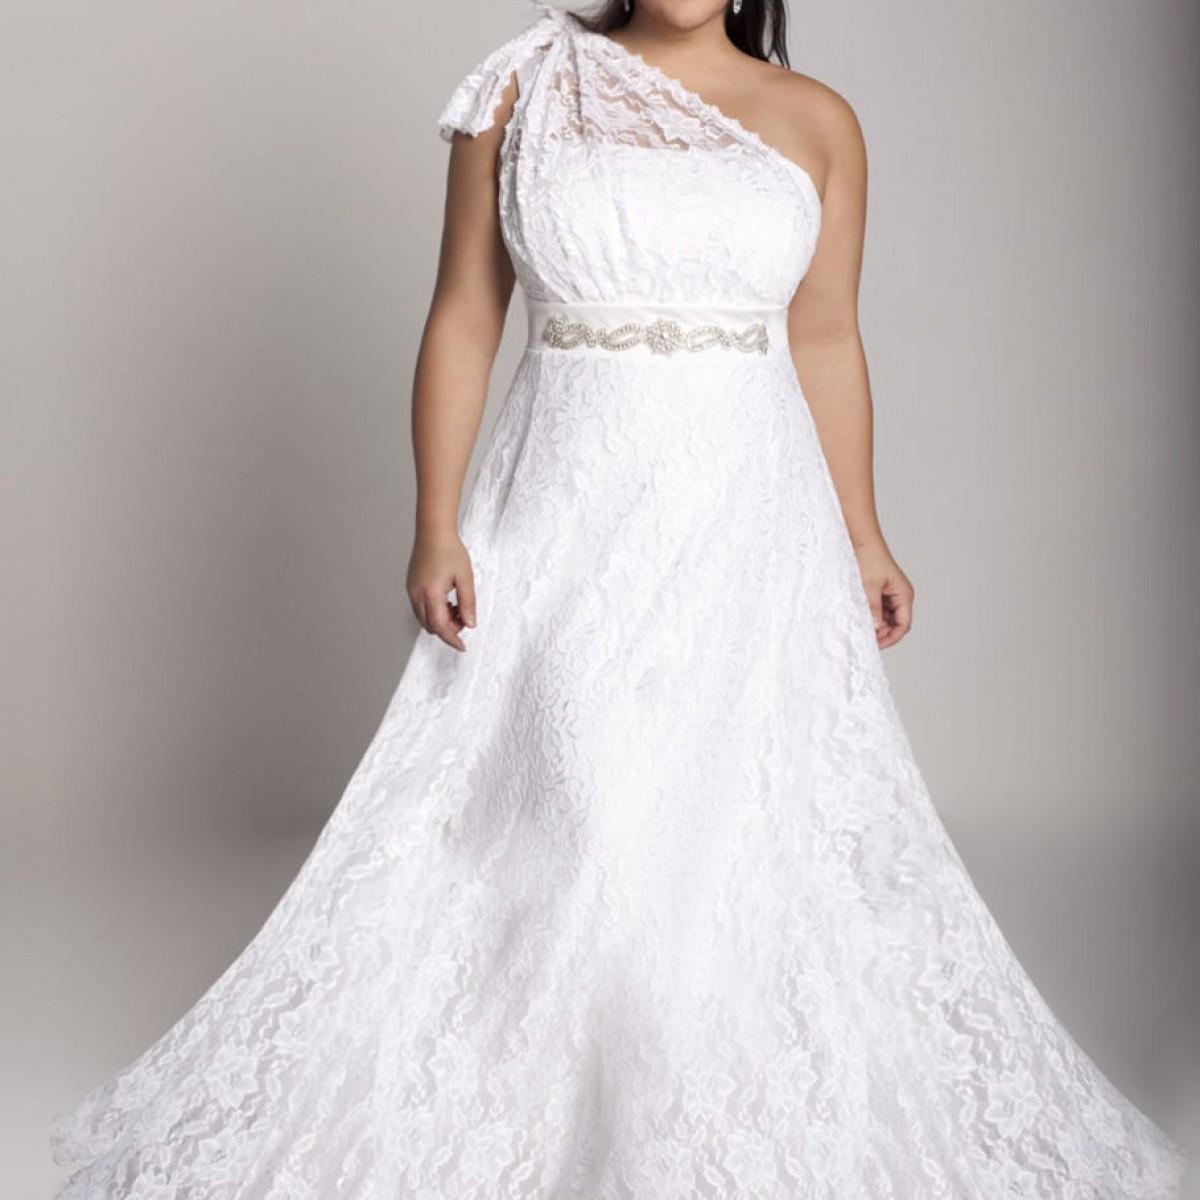 Macy S Wedding Gowns: Macys Beach Wedding Dresses